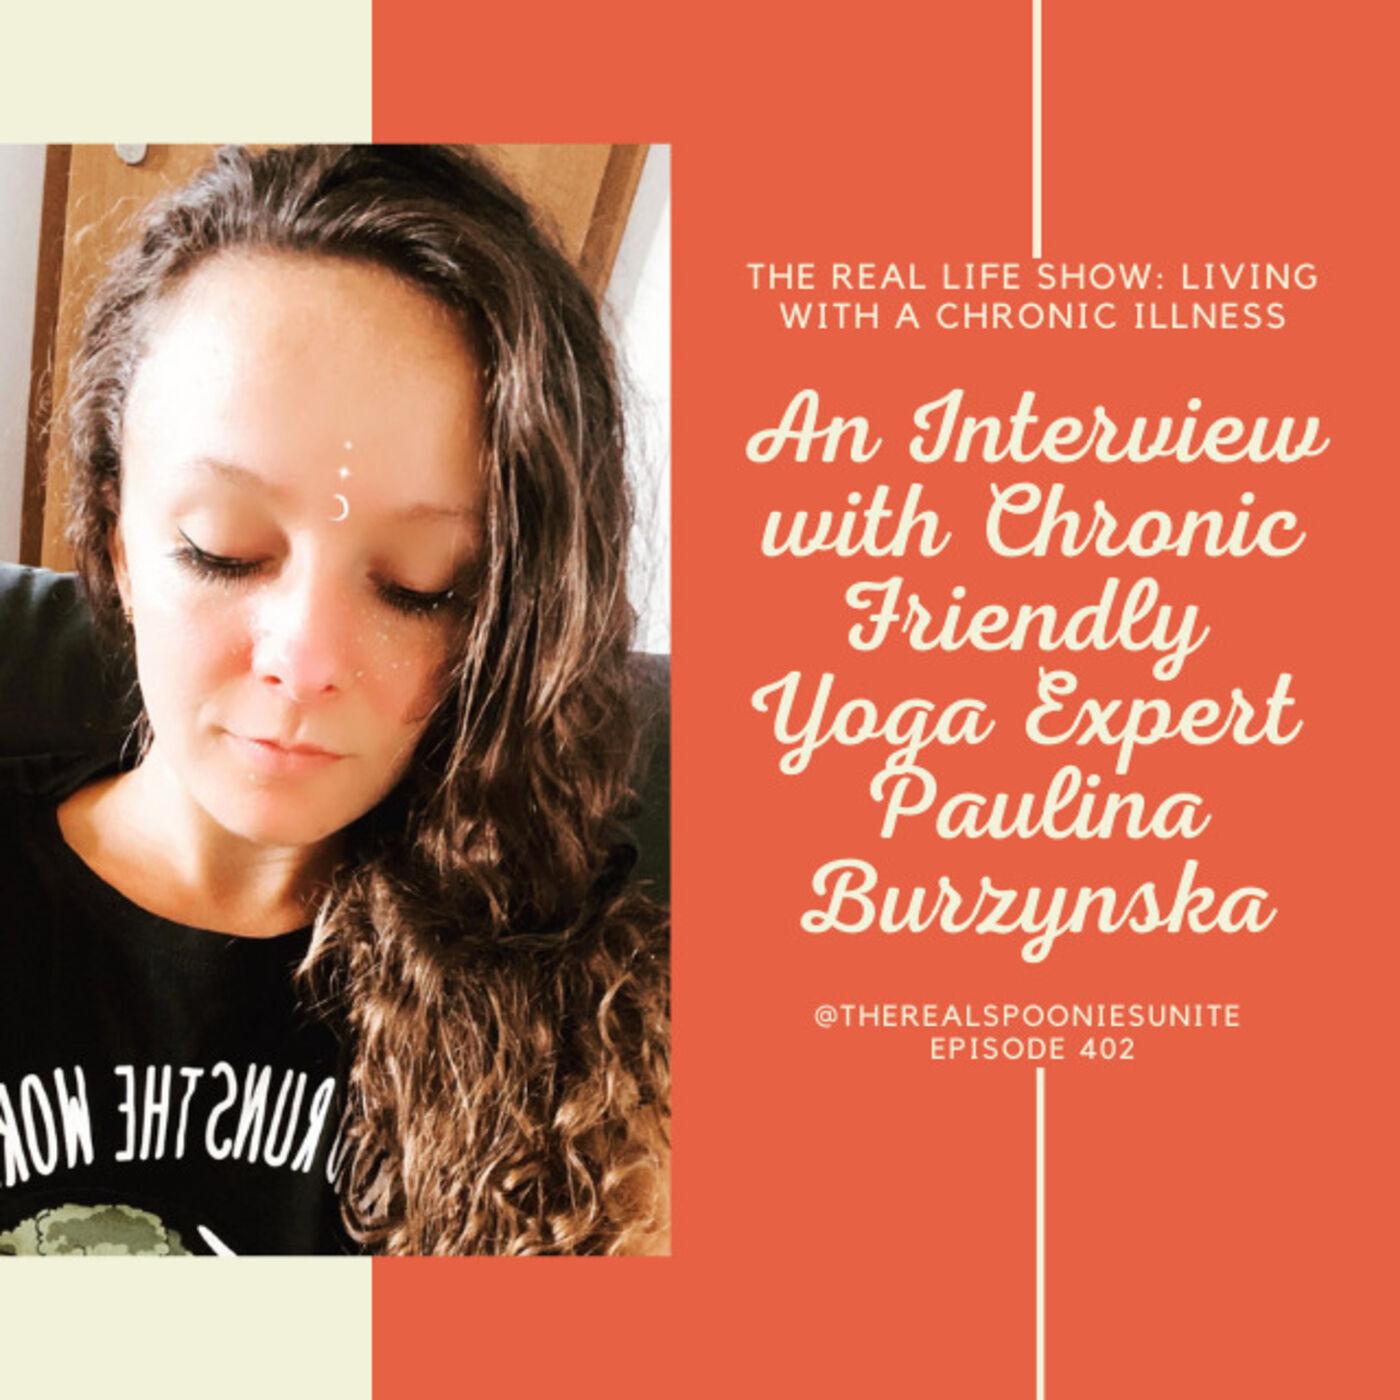 An Interview with Chronic Friendly Yoga Expert Paulina Burzynska